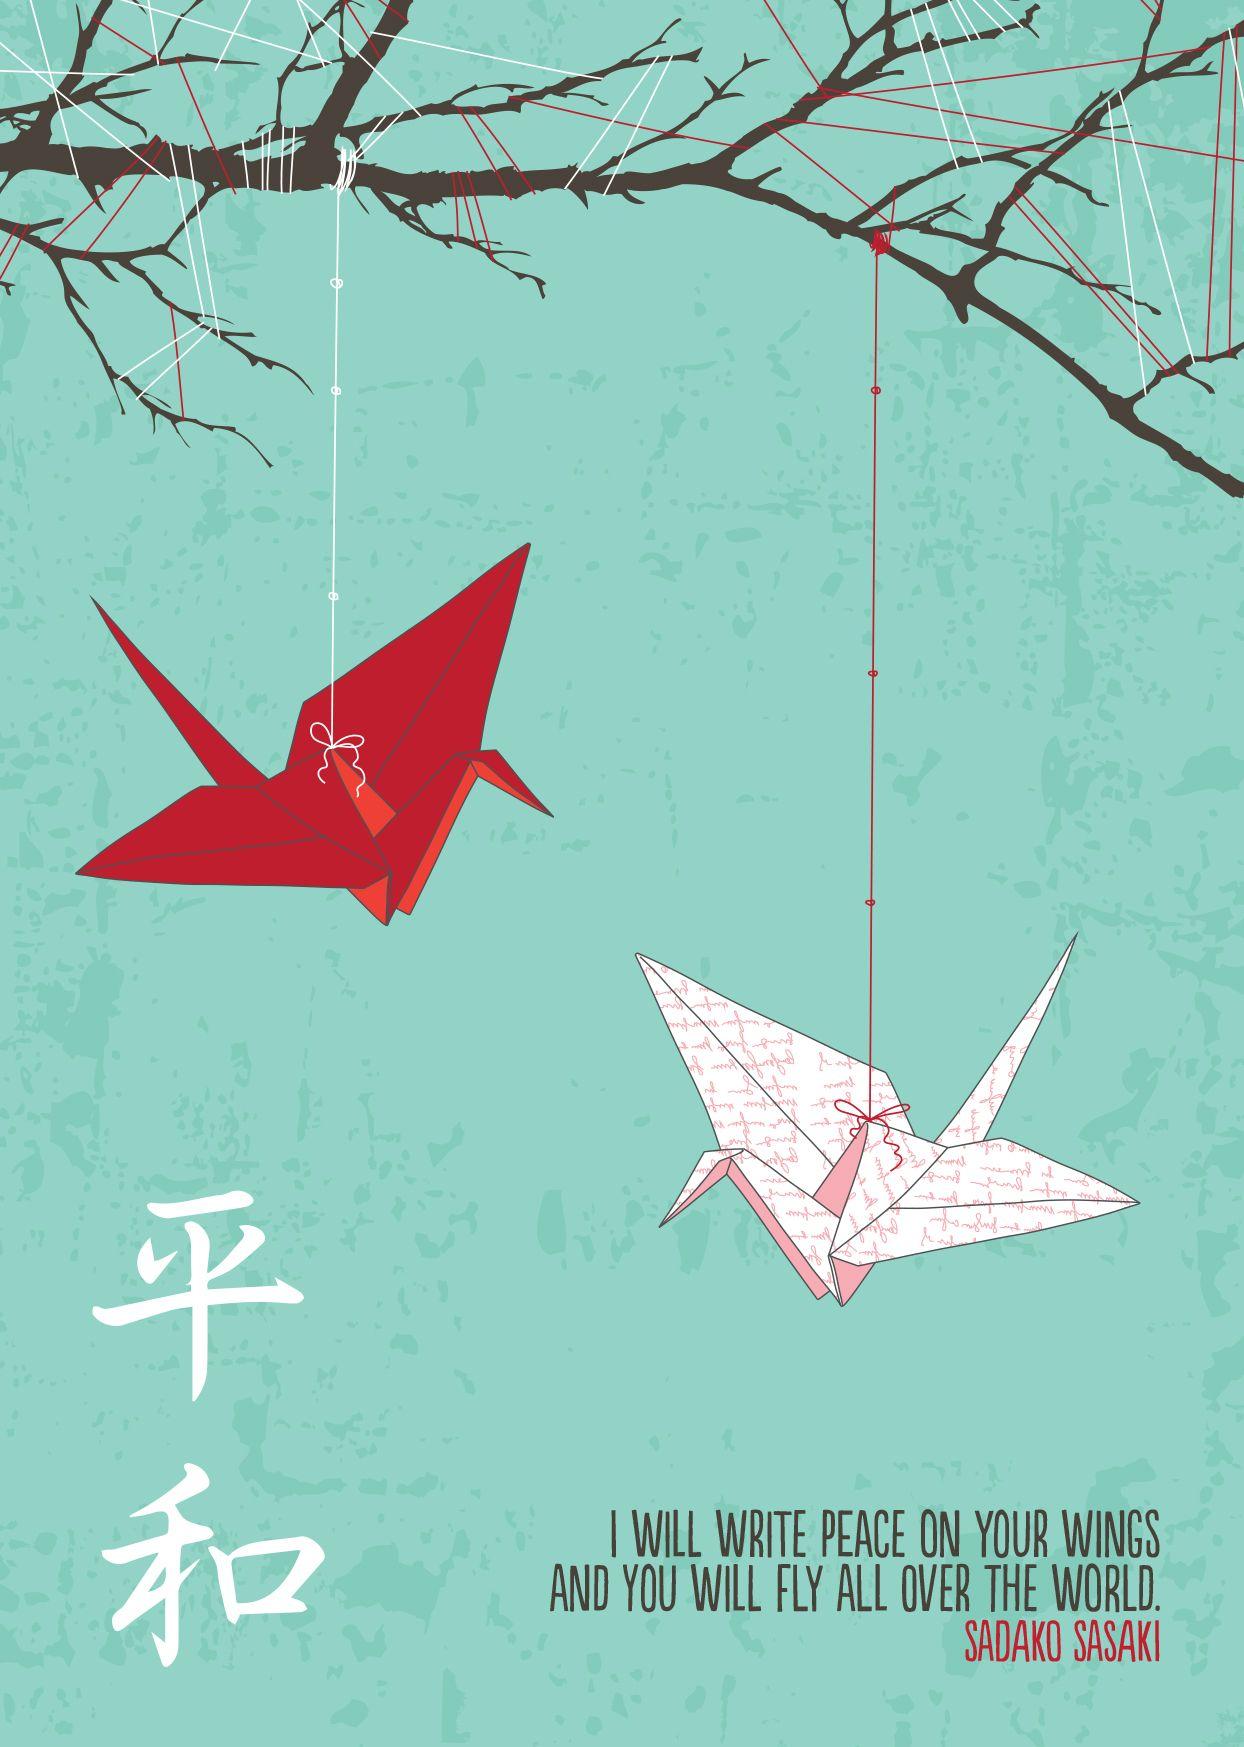 Sadako Gift Pack In 2019 Here You Hear Me Origami Art Swan Diagram Embroidery Sasaki Quotes Crane Drawing Paper Tattoo